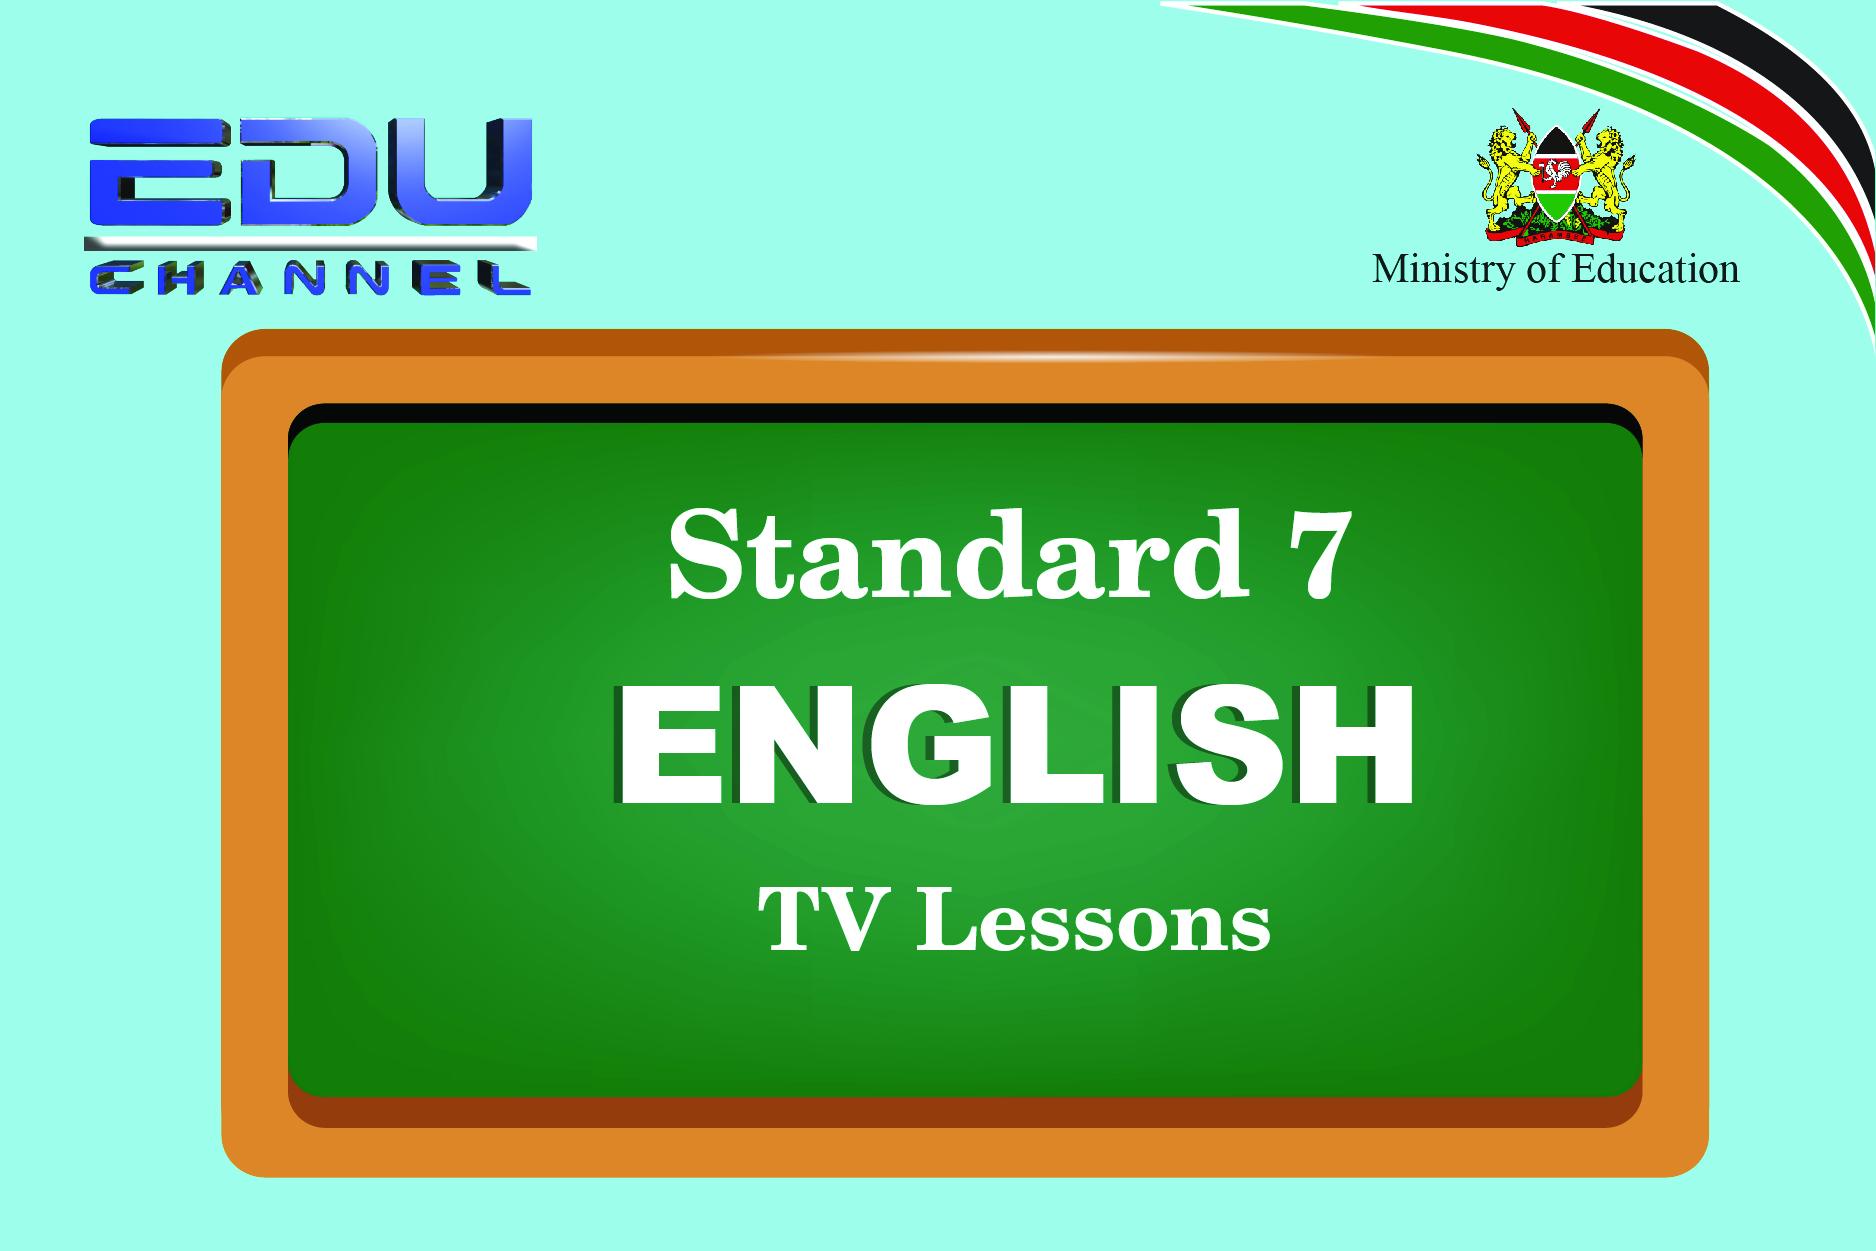 Standard 7 English Lesson 1:Oral Work Language Pattern